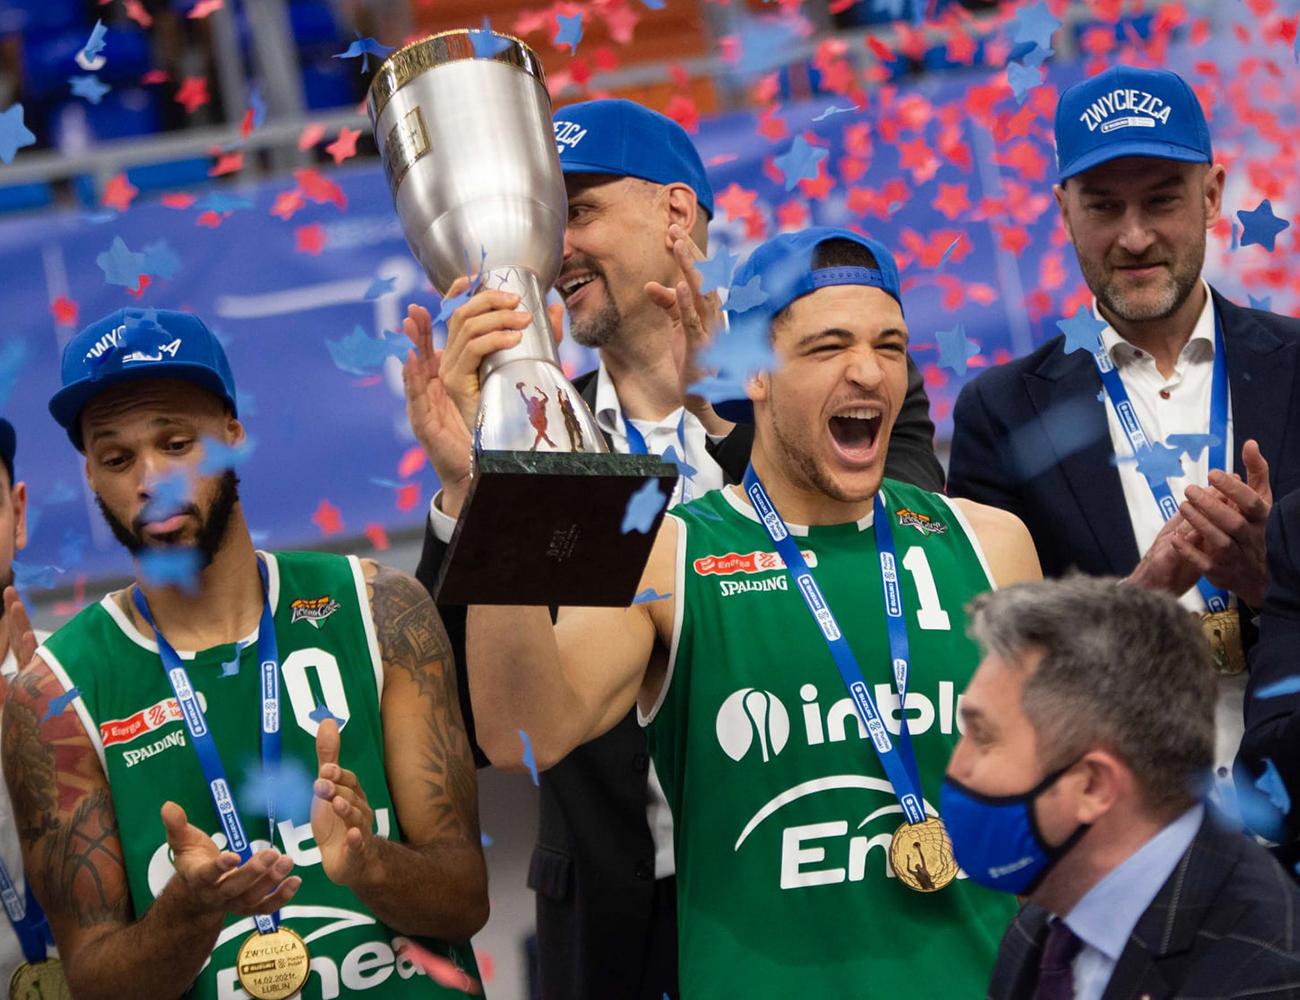 Zielona Gora win Polish Cup